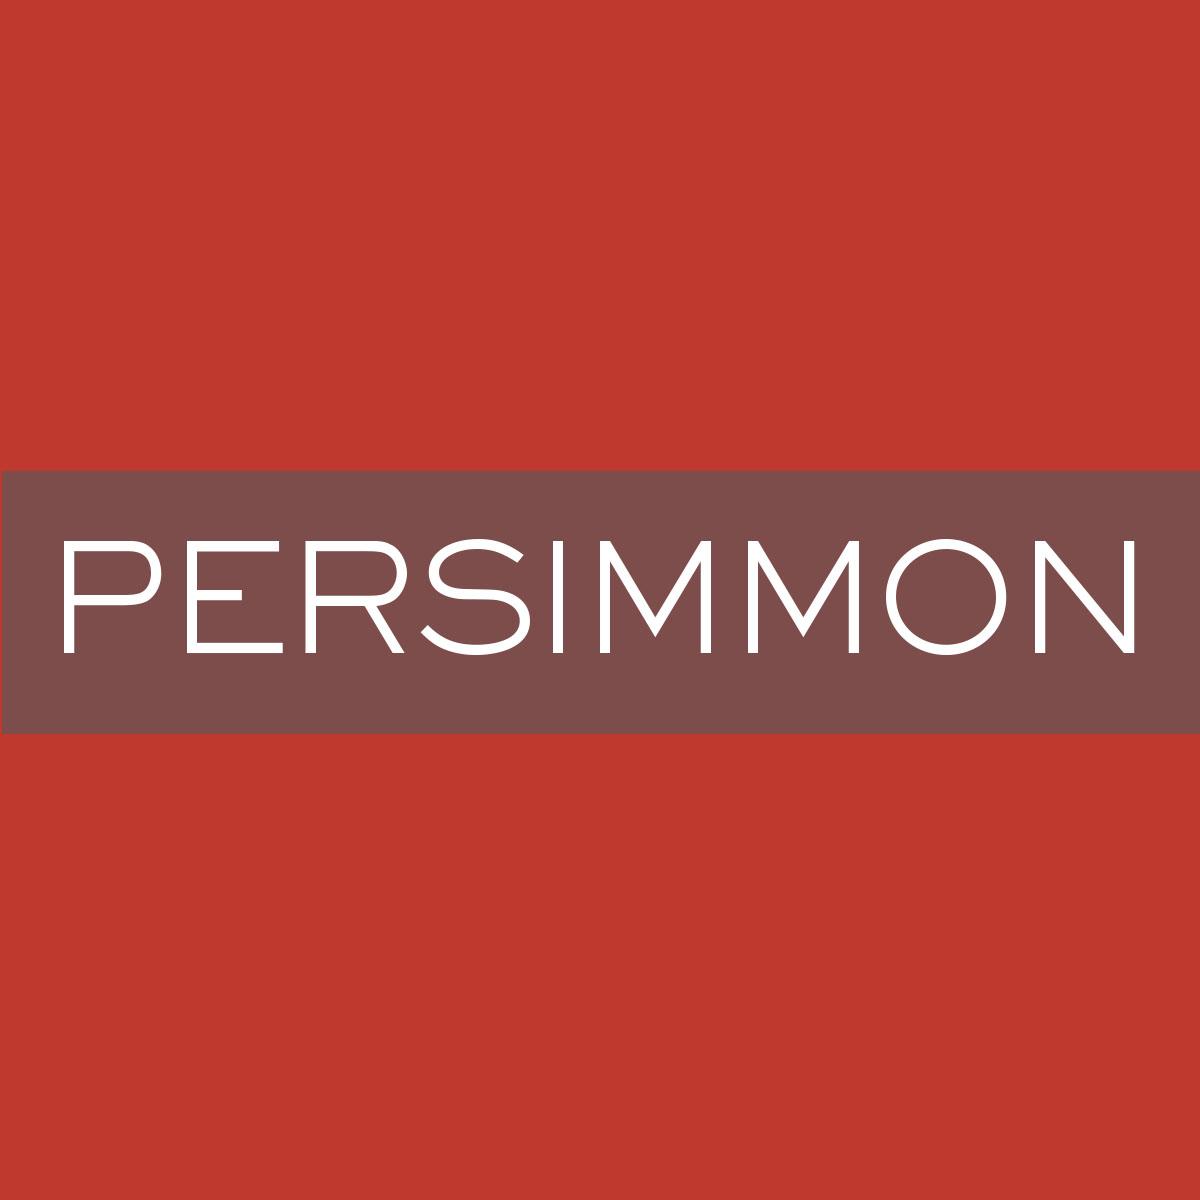 WNP_Persimmon.jpg